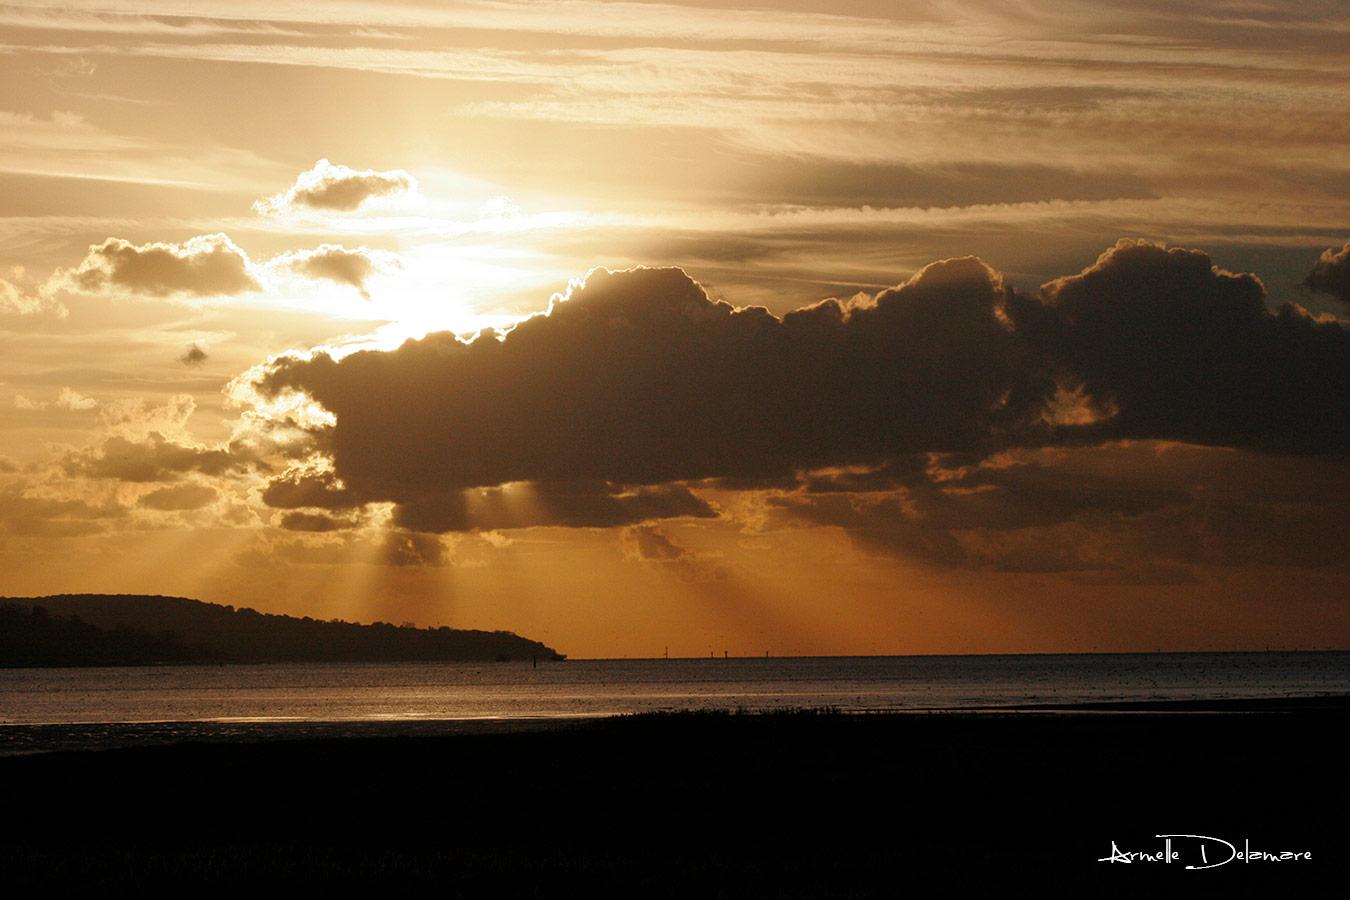 Armelle Delamare Photographe Pavilly Photographie paysage